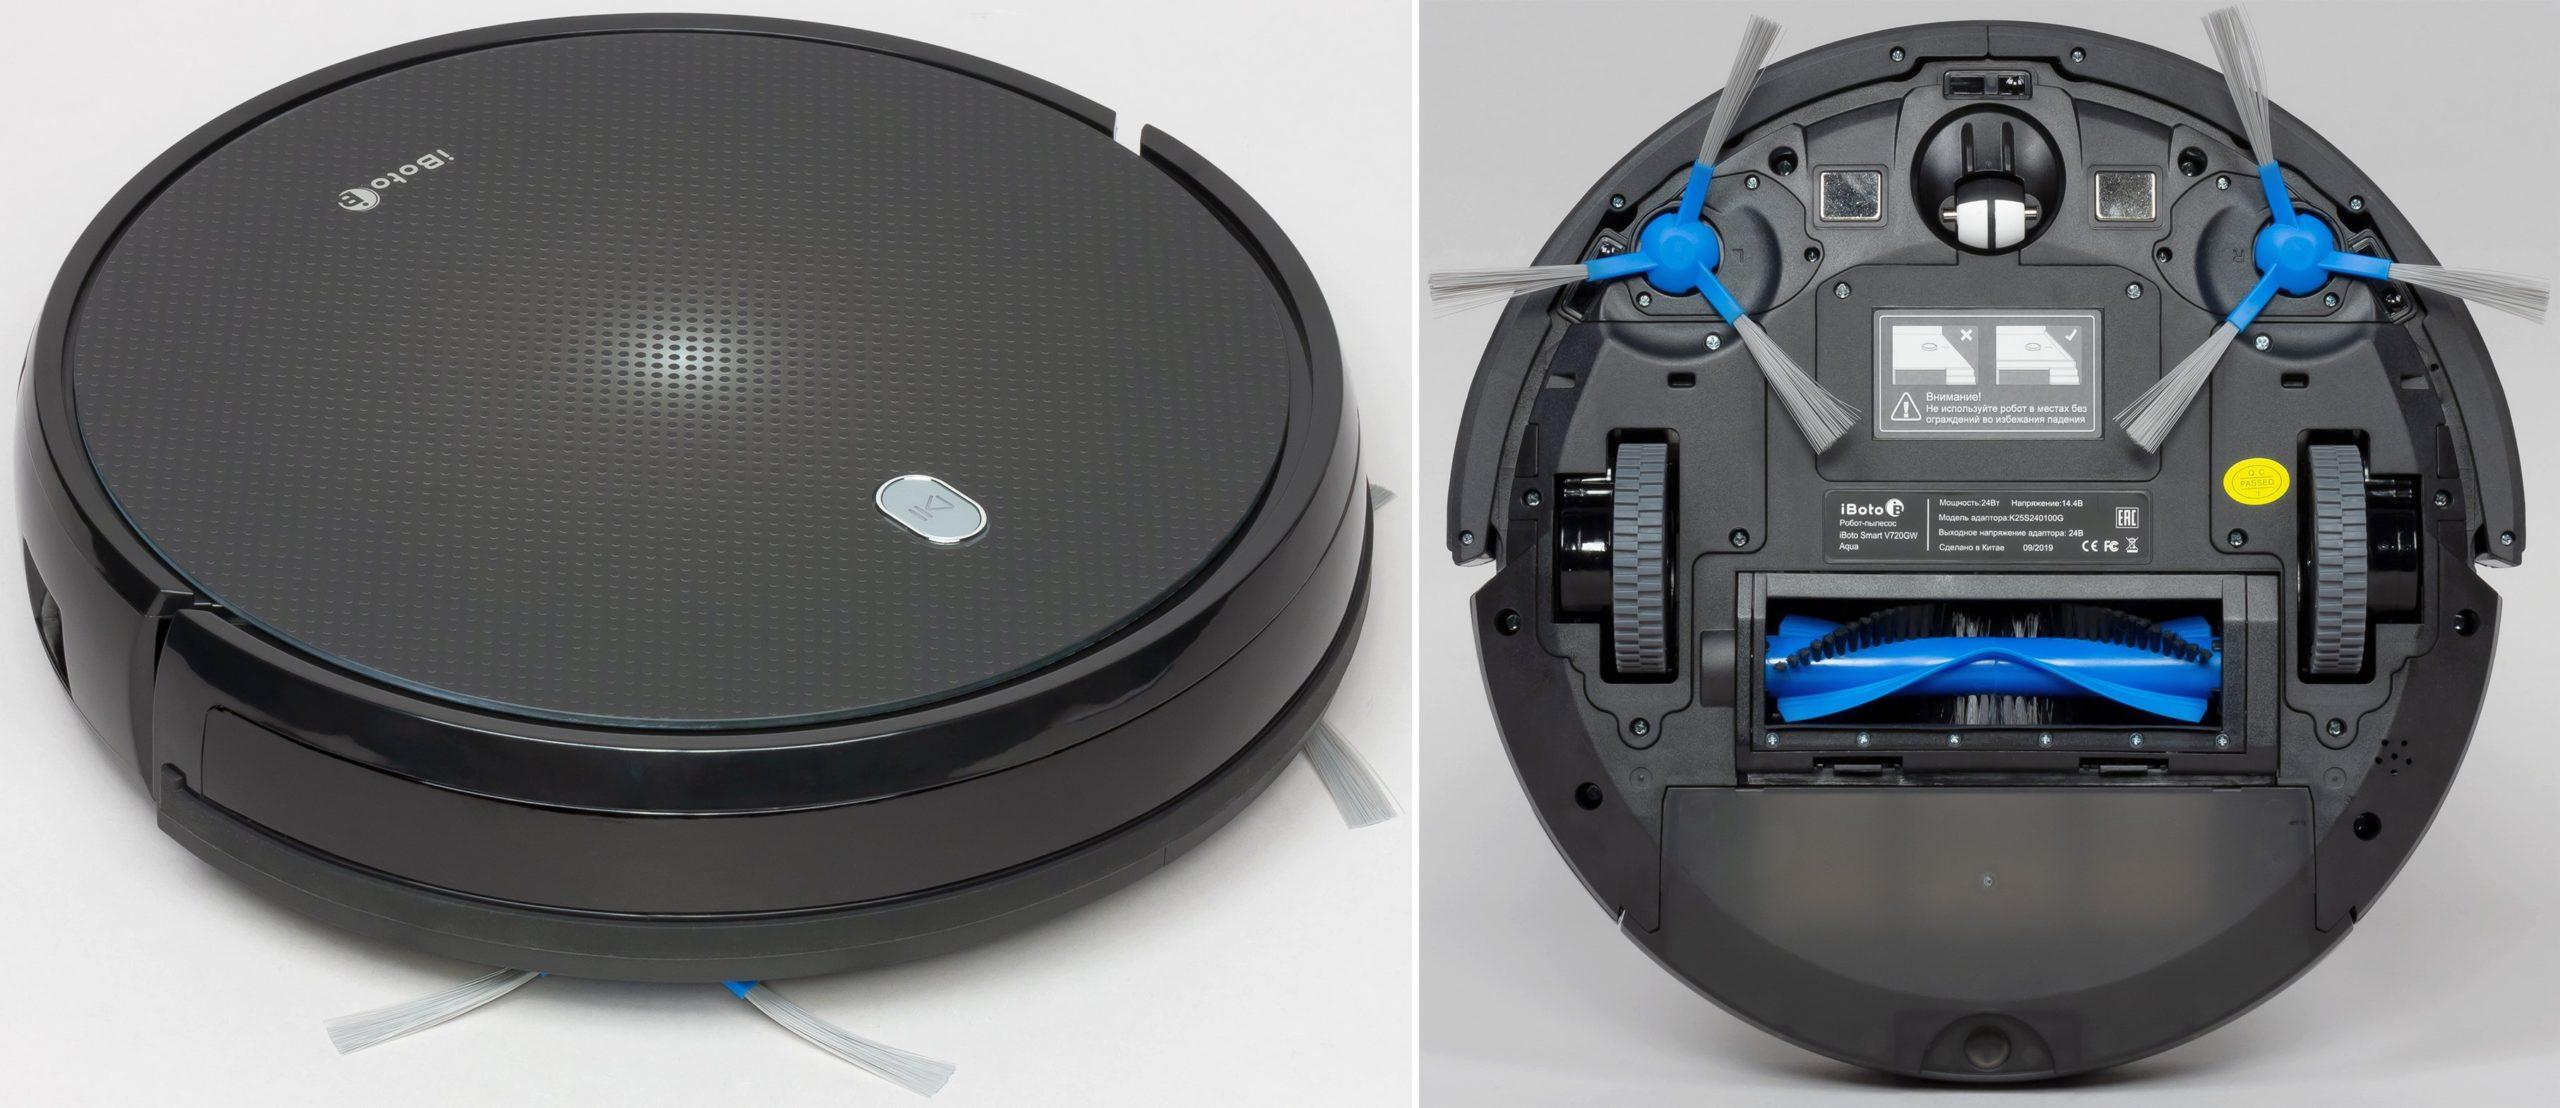 Внешний вид iboto smart v720gw aqua